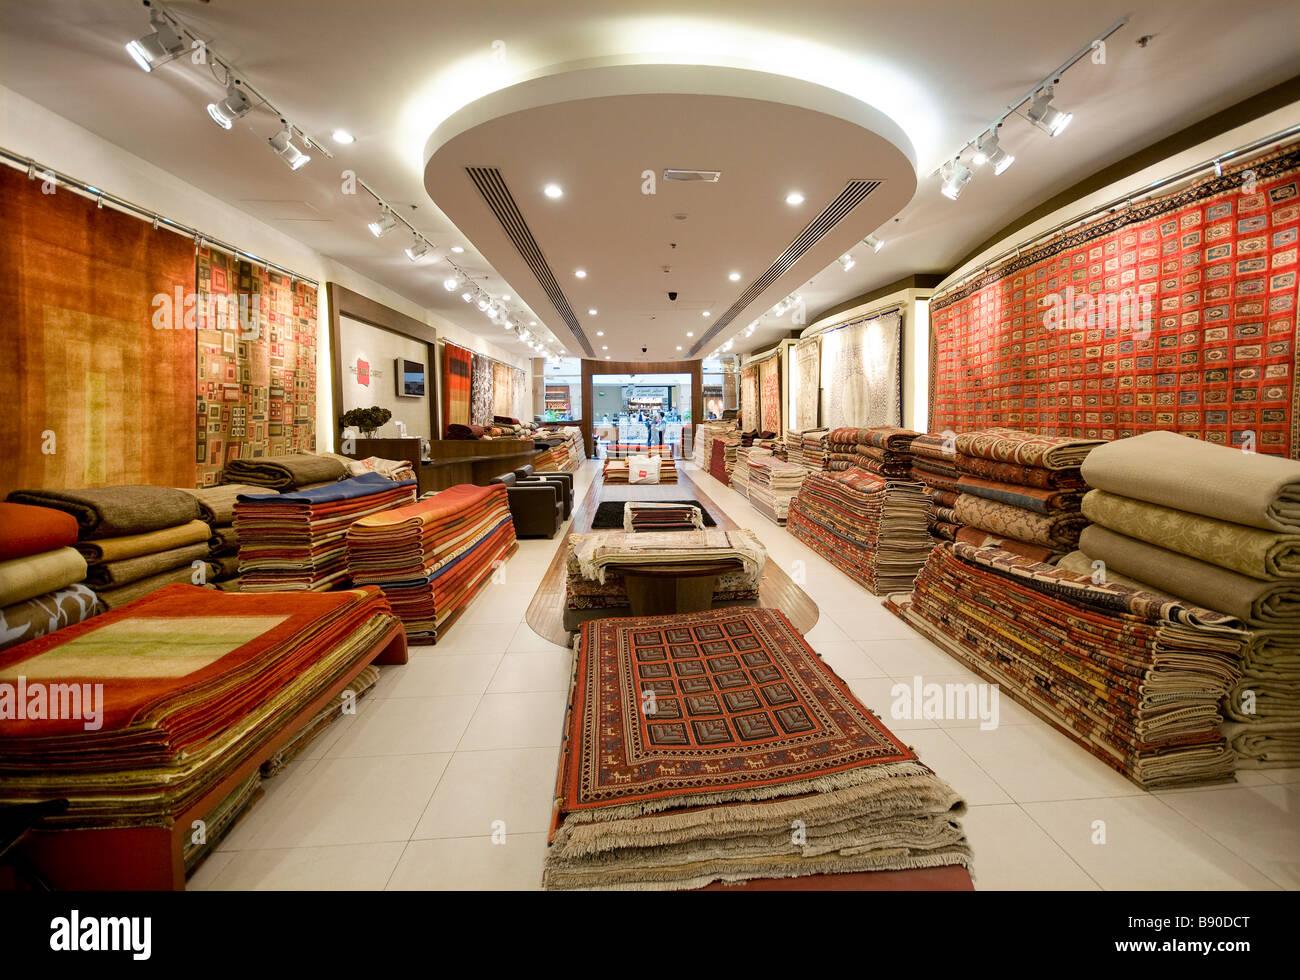 Rug And Carpet Store Shopping Mall Dubai Uae Stock